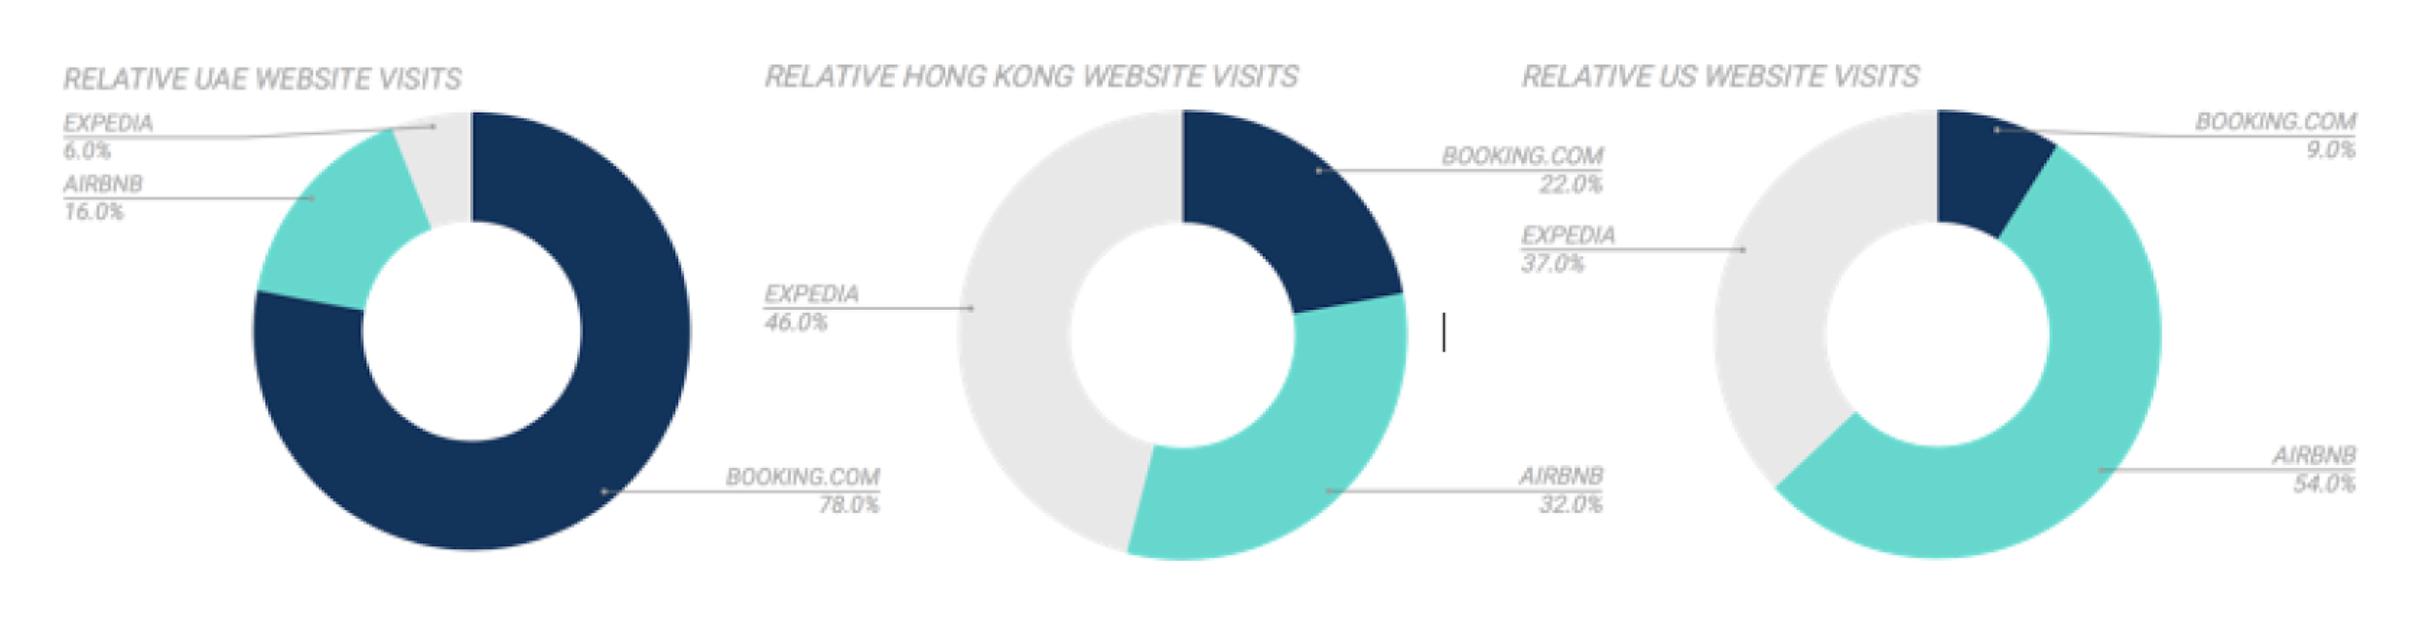 Relative Website Visits